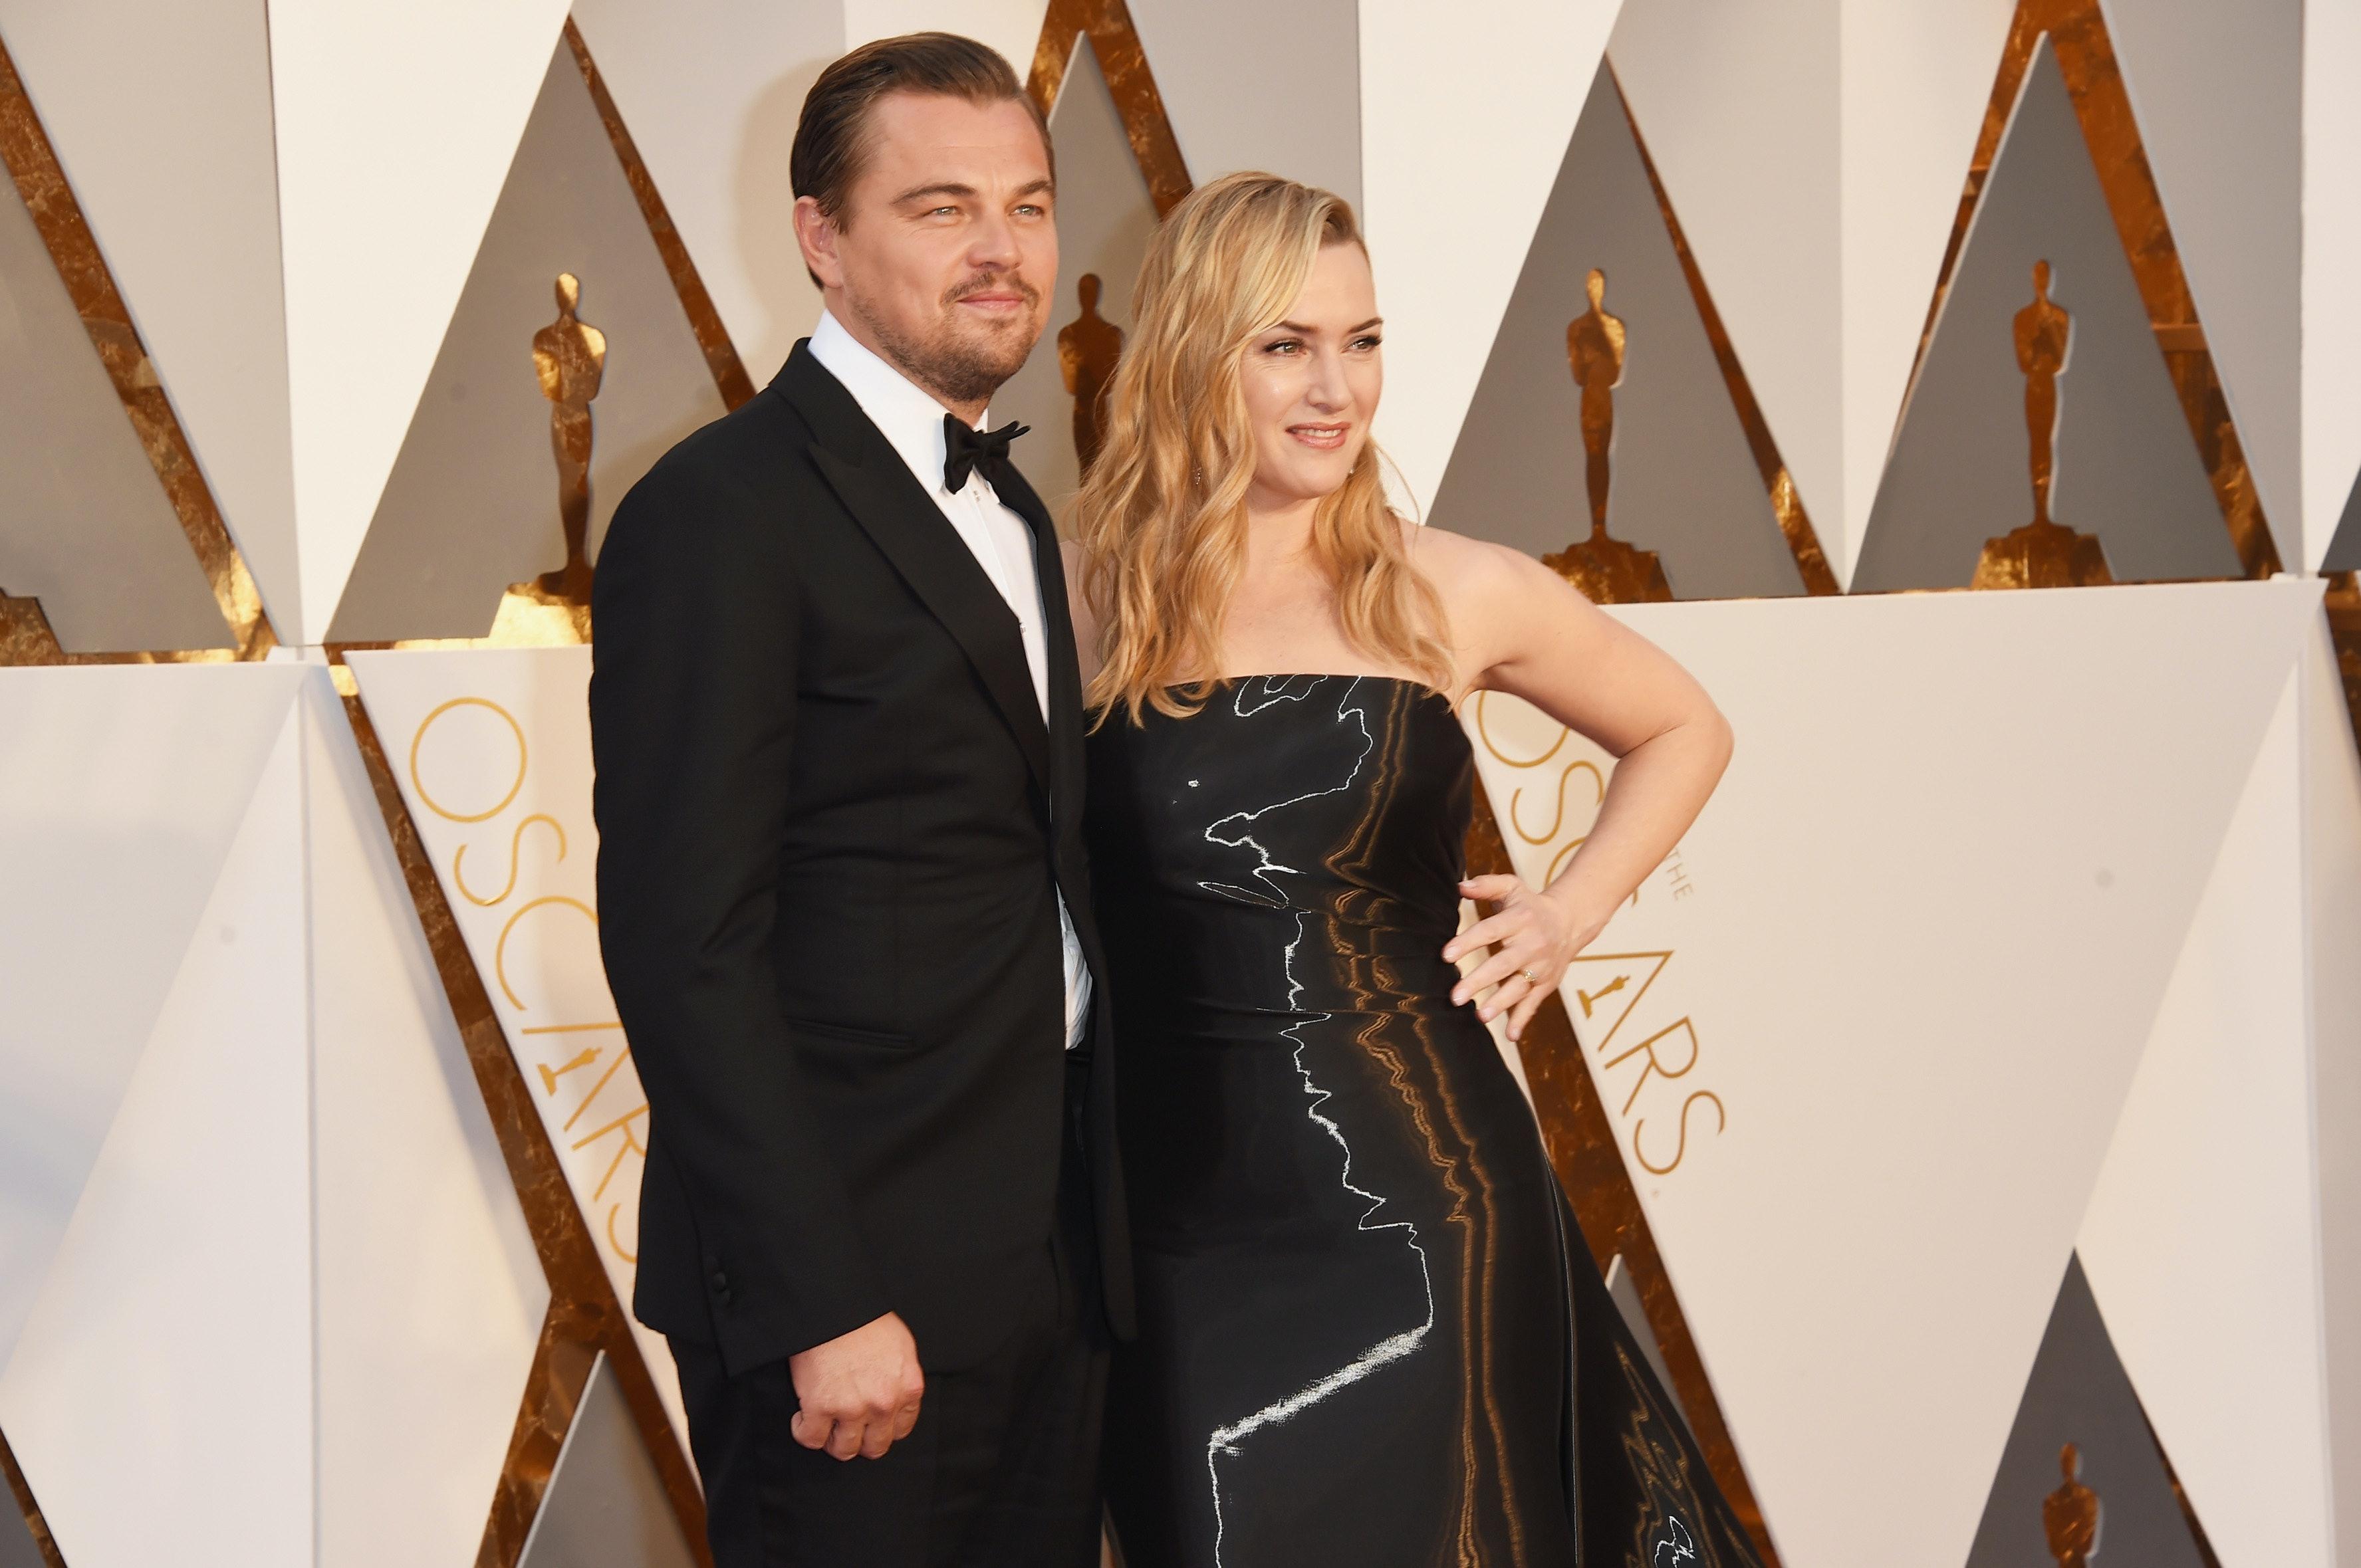 'Titanic' co-stars Kate Winslet and Leonardo DiCaprio reunite on Oscars red carpet